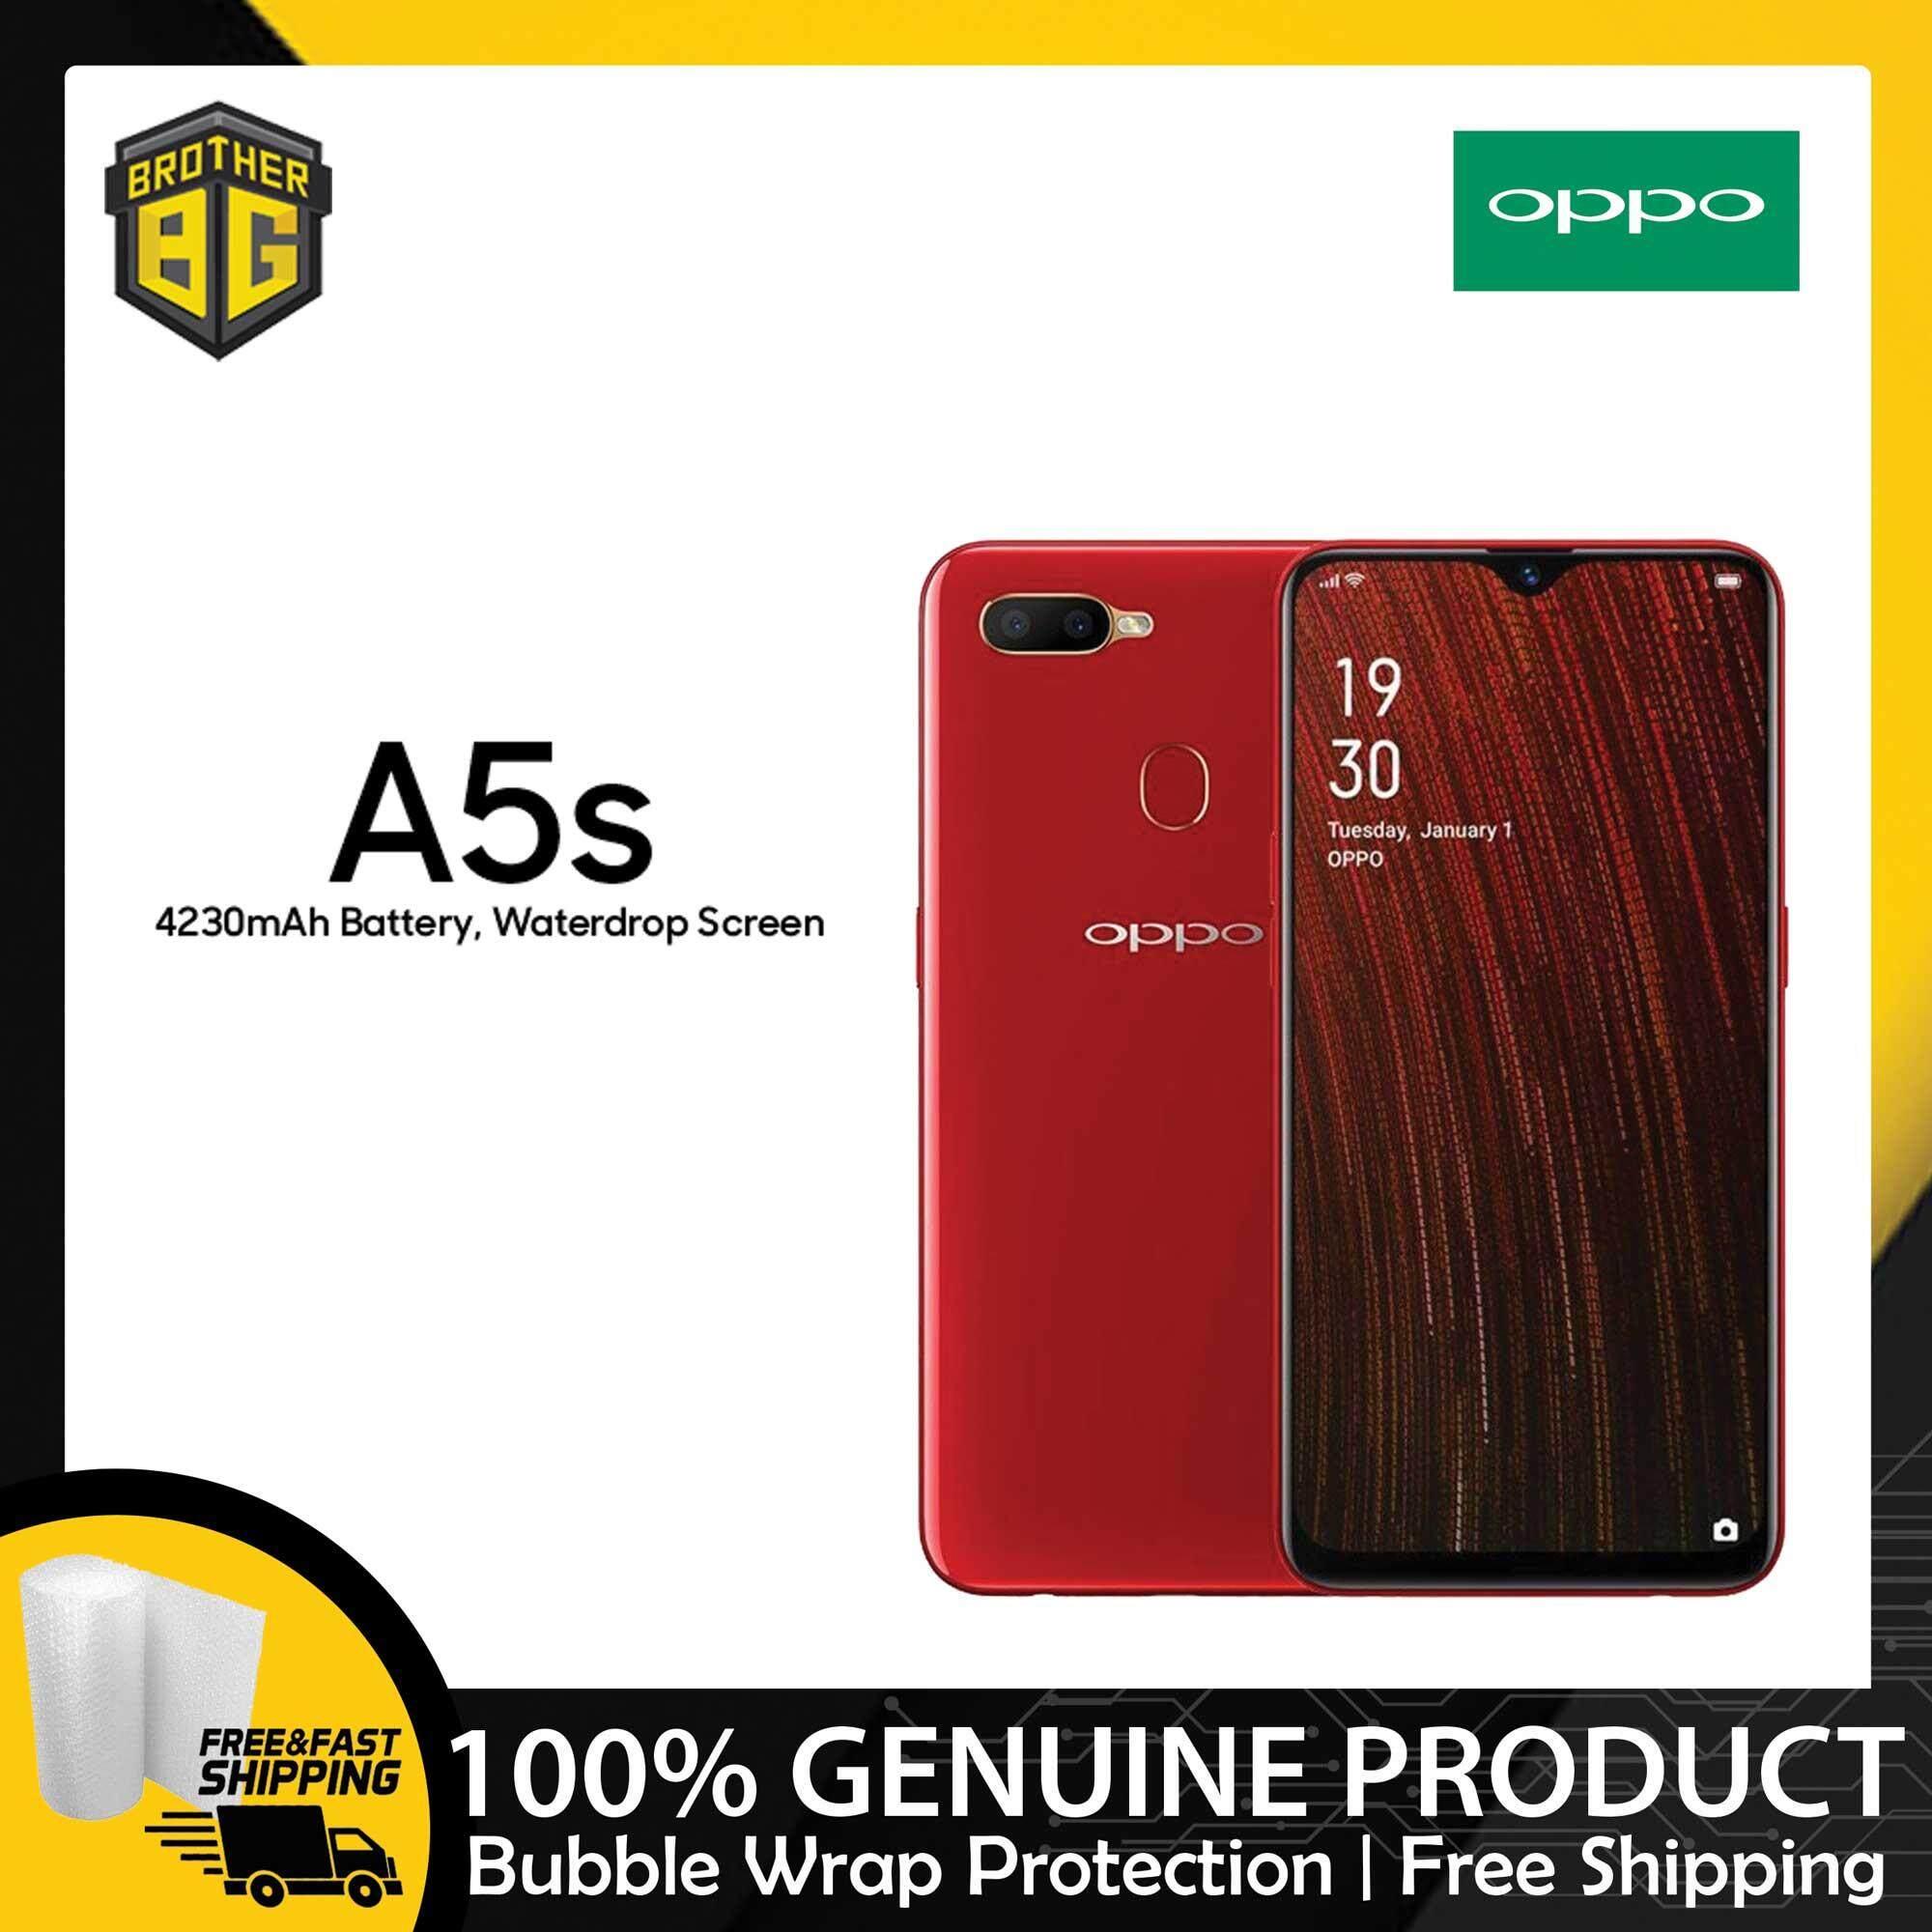 OPPO A5S 3GB+32GB - Original Malaysia Set